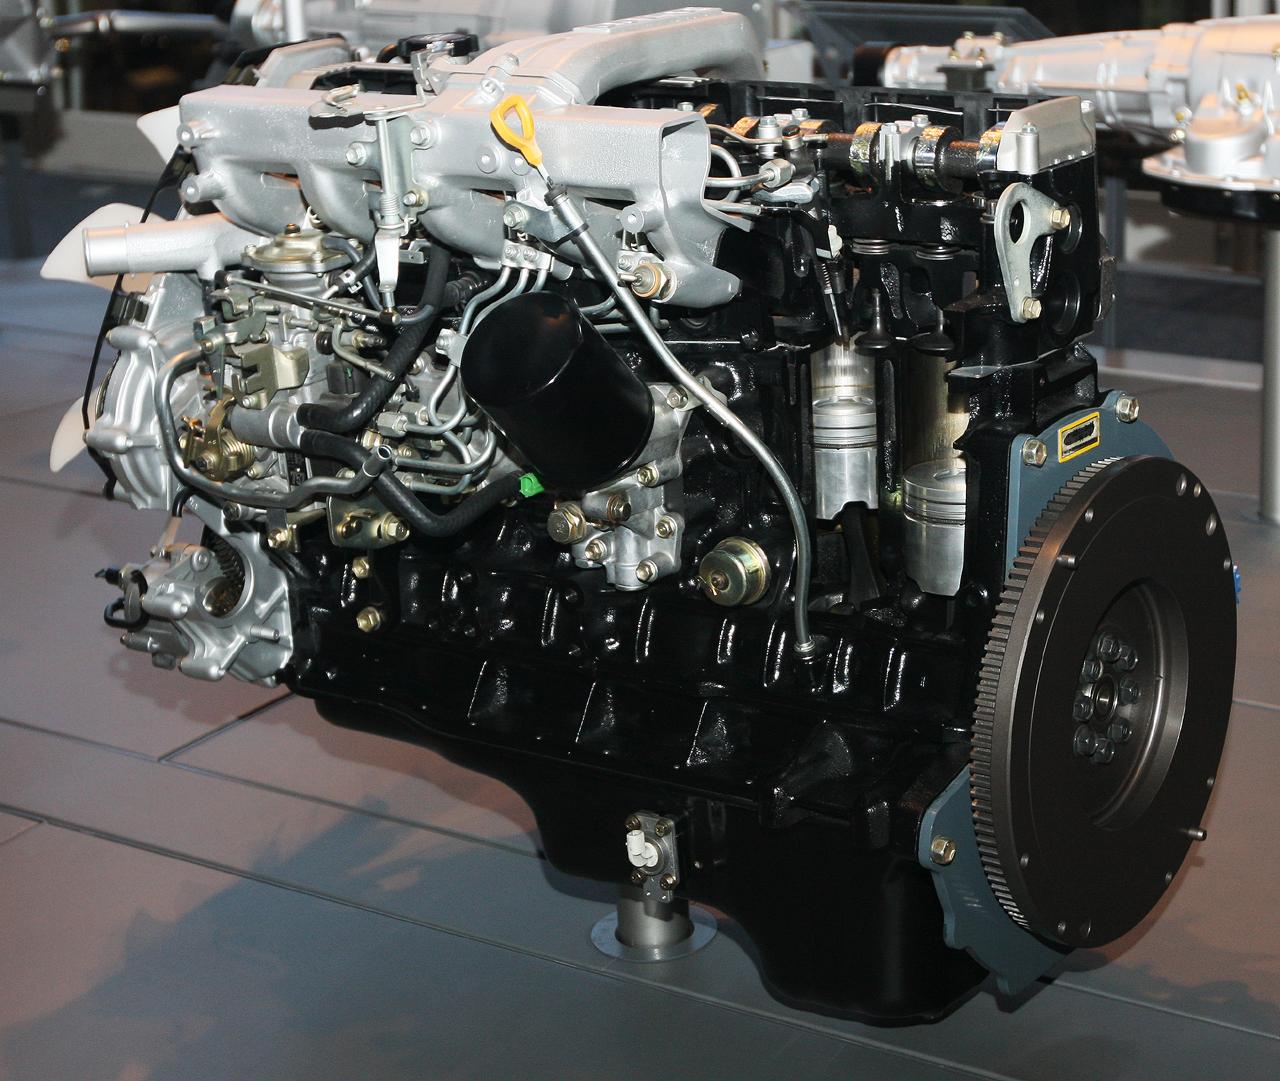 Description 1989 Toyota 1HDT Type engine rear.jpg